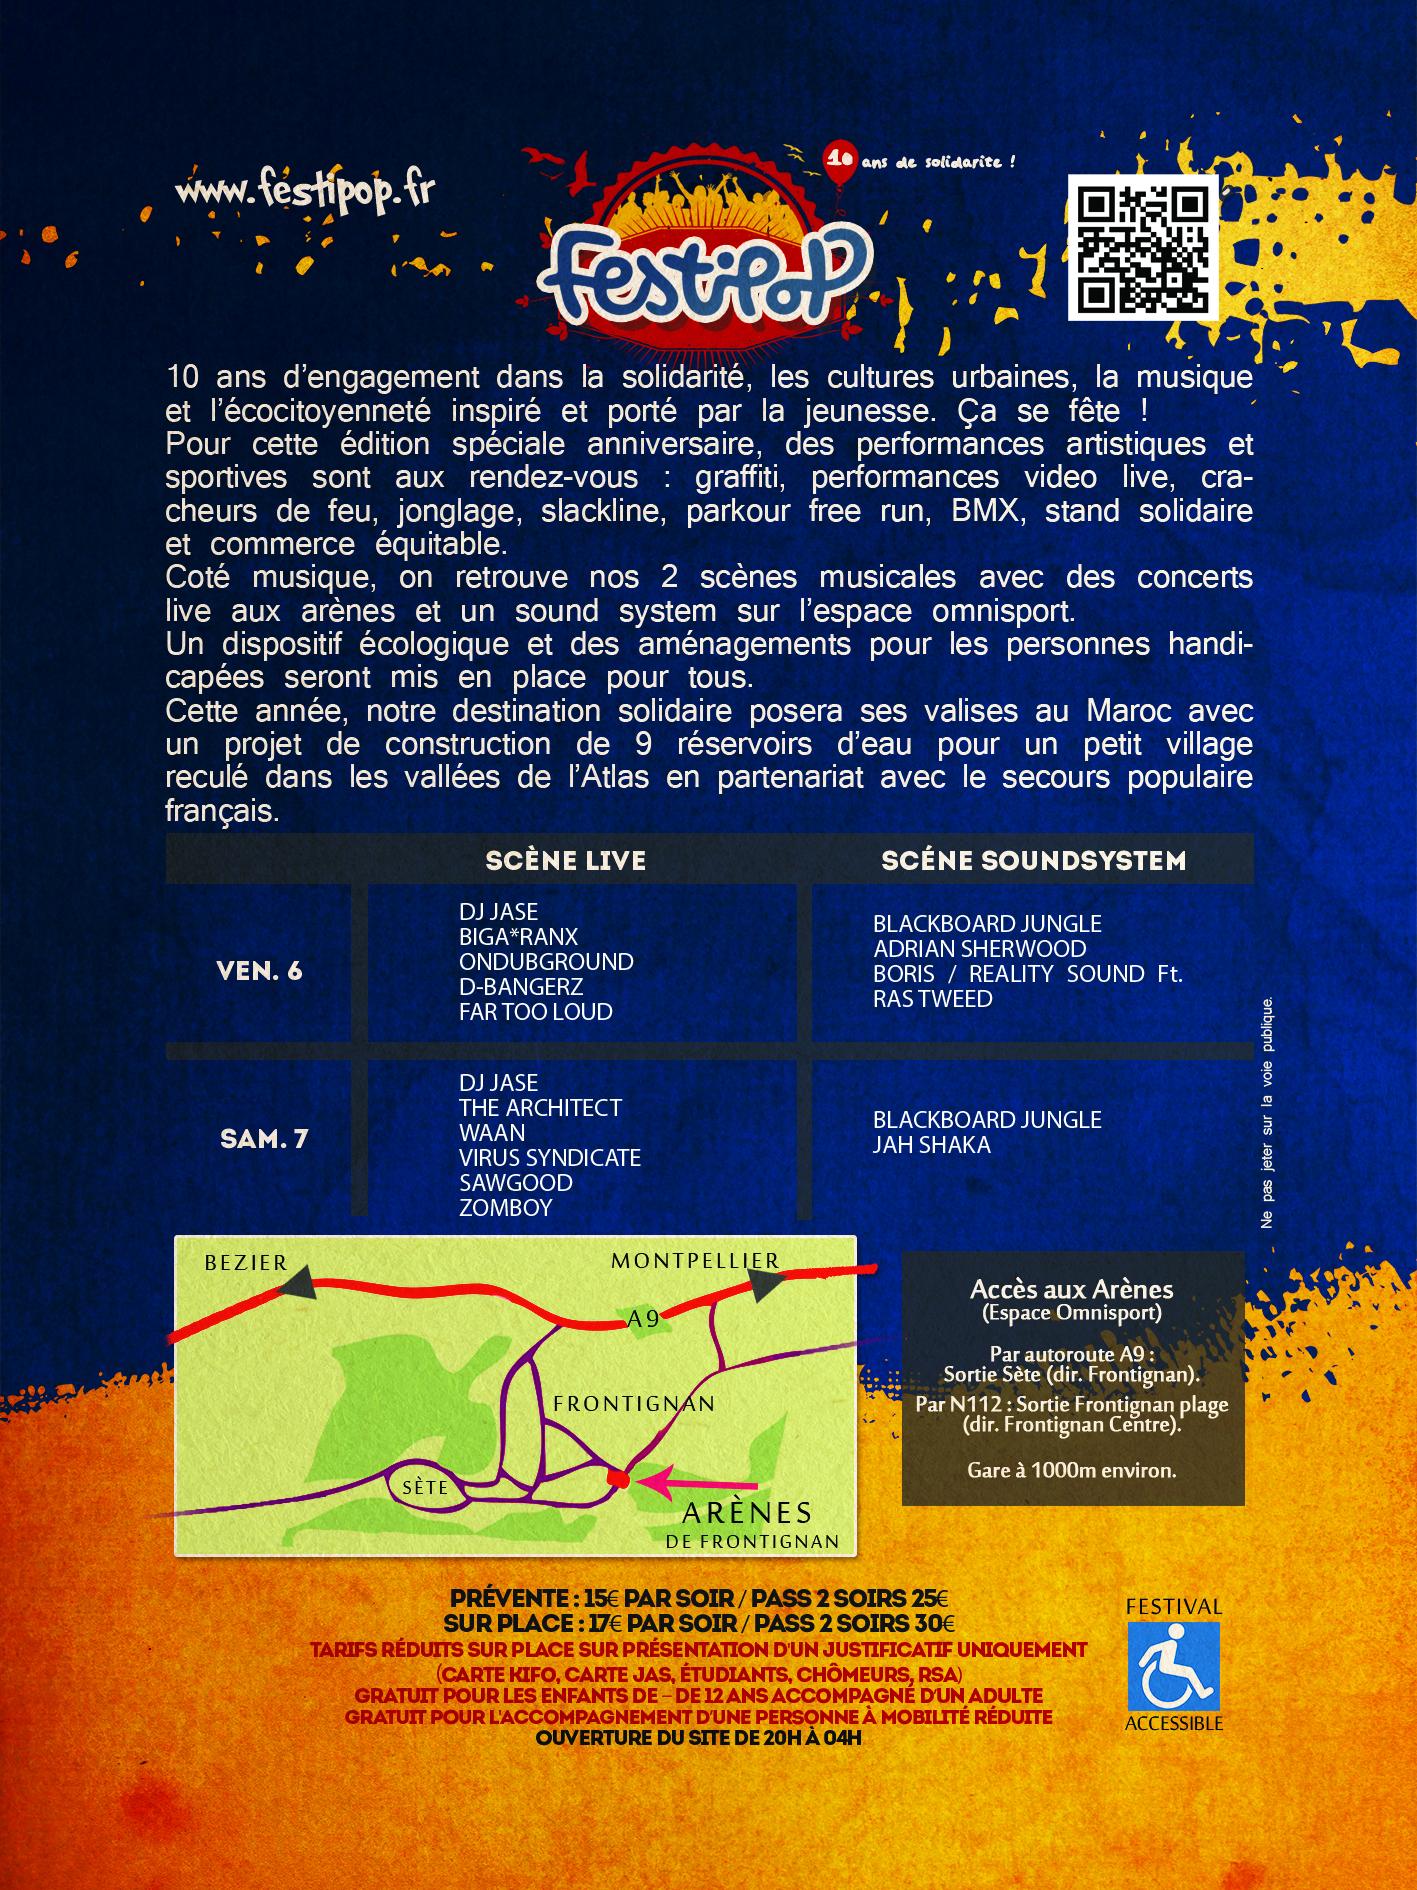 Flyer-festipop2013-A6-VERSO